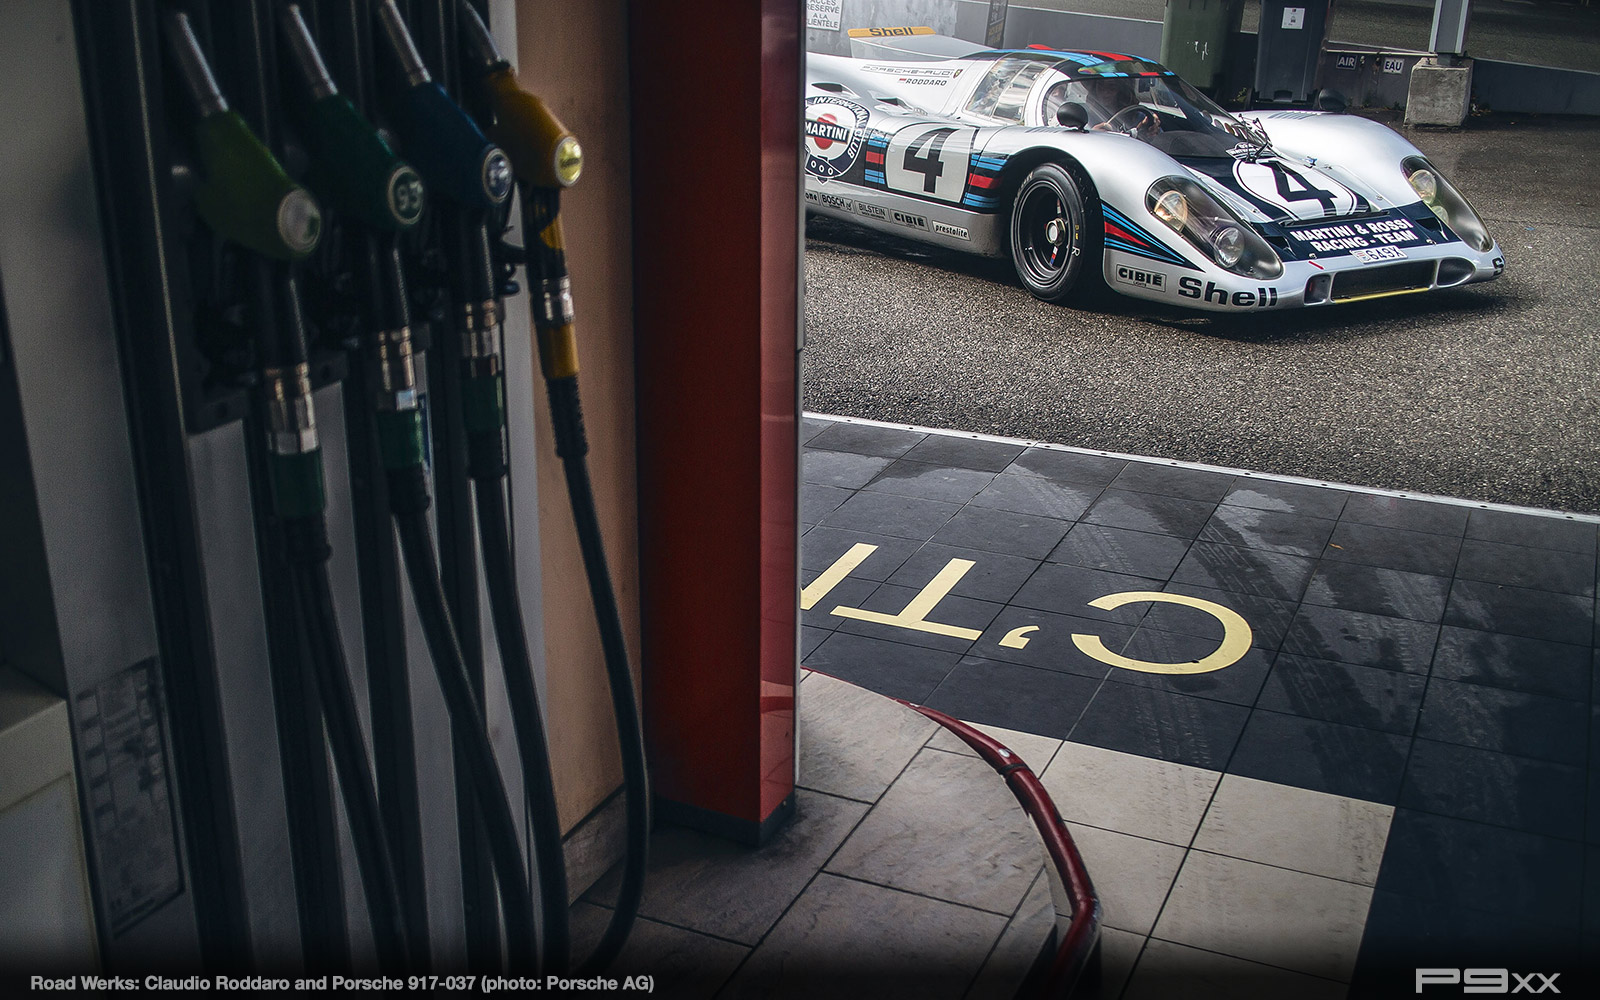 Porsche-917-037-Martini-Racing-Monaco-2018-311